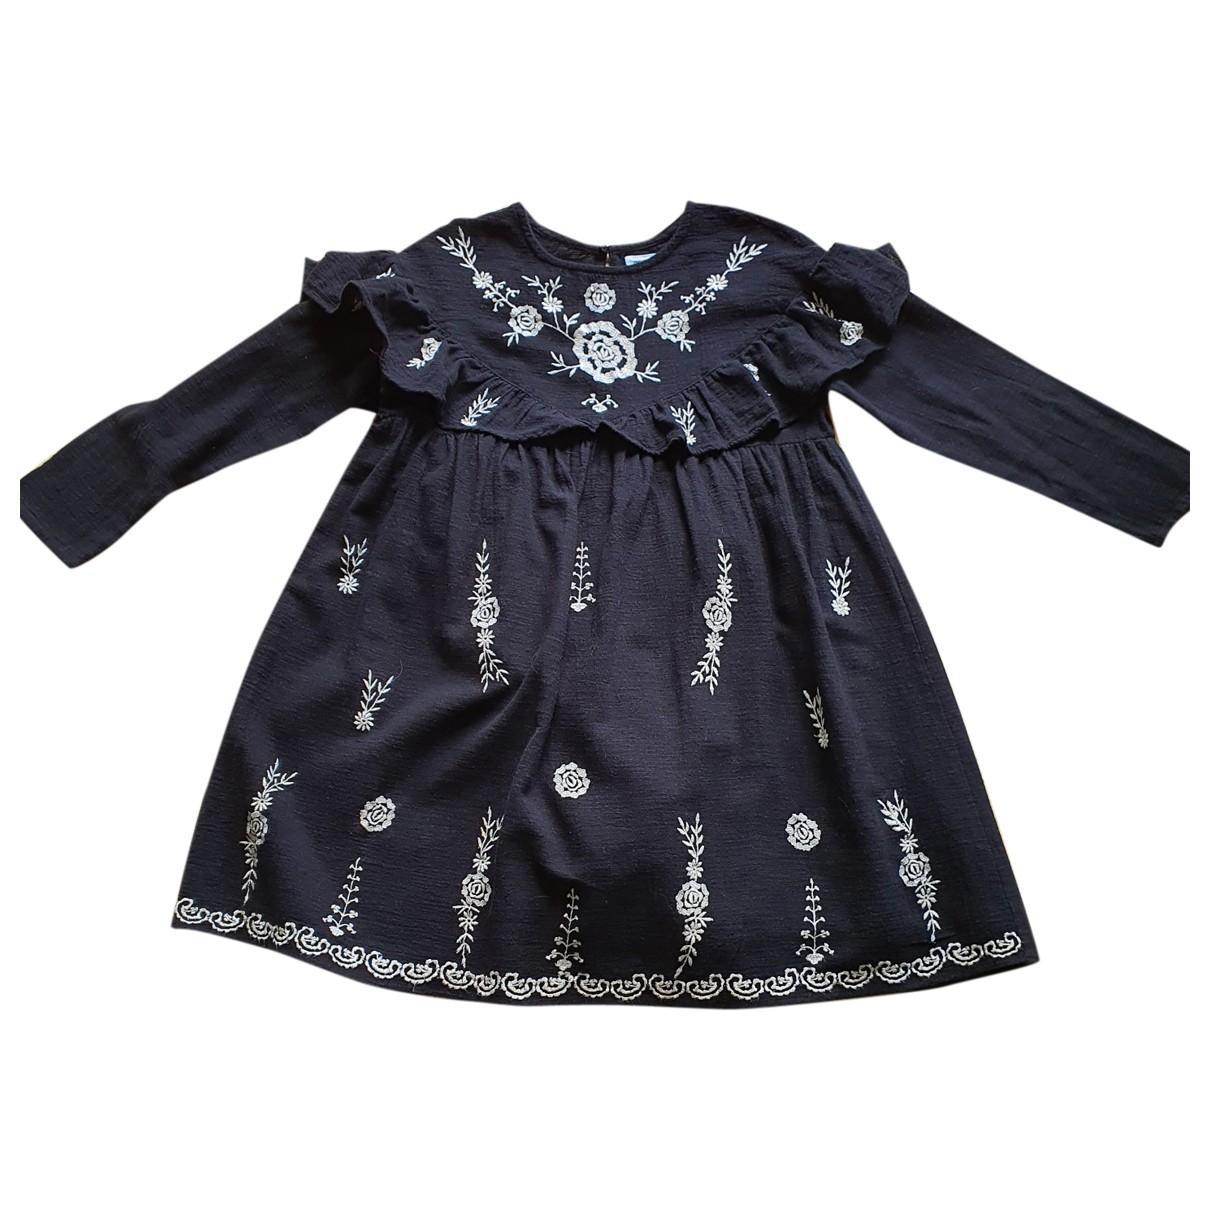 Zara \N Black Cotton dress for Kids 10 years - up to 142cm FR